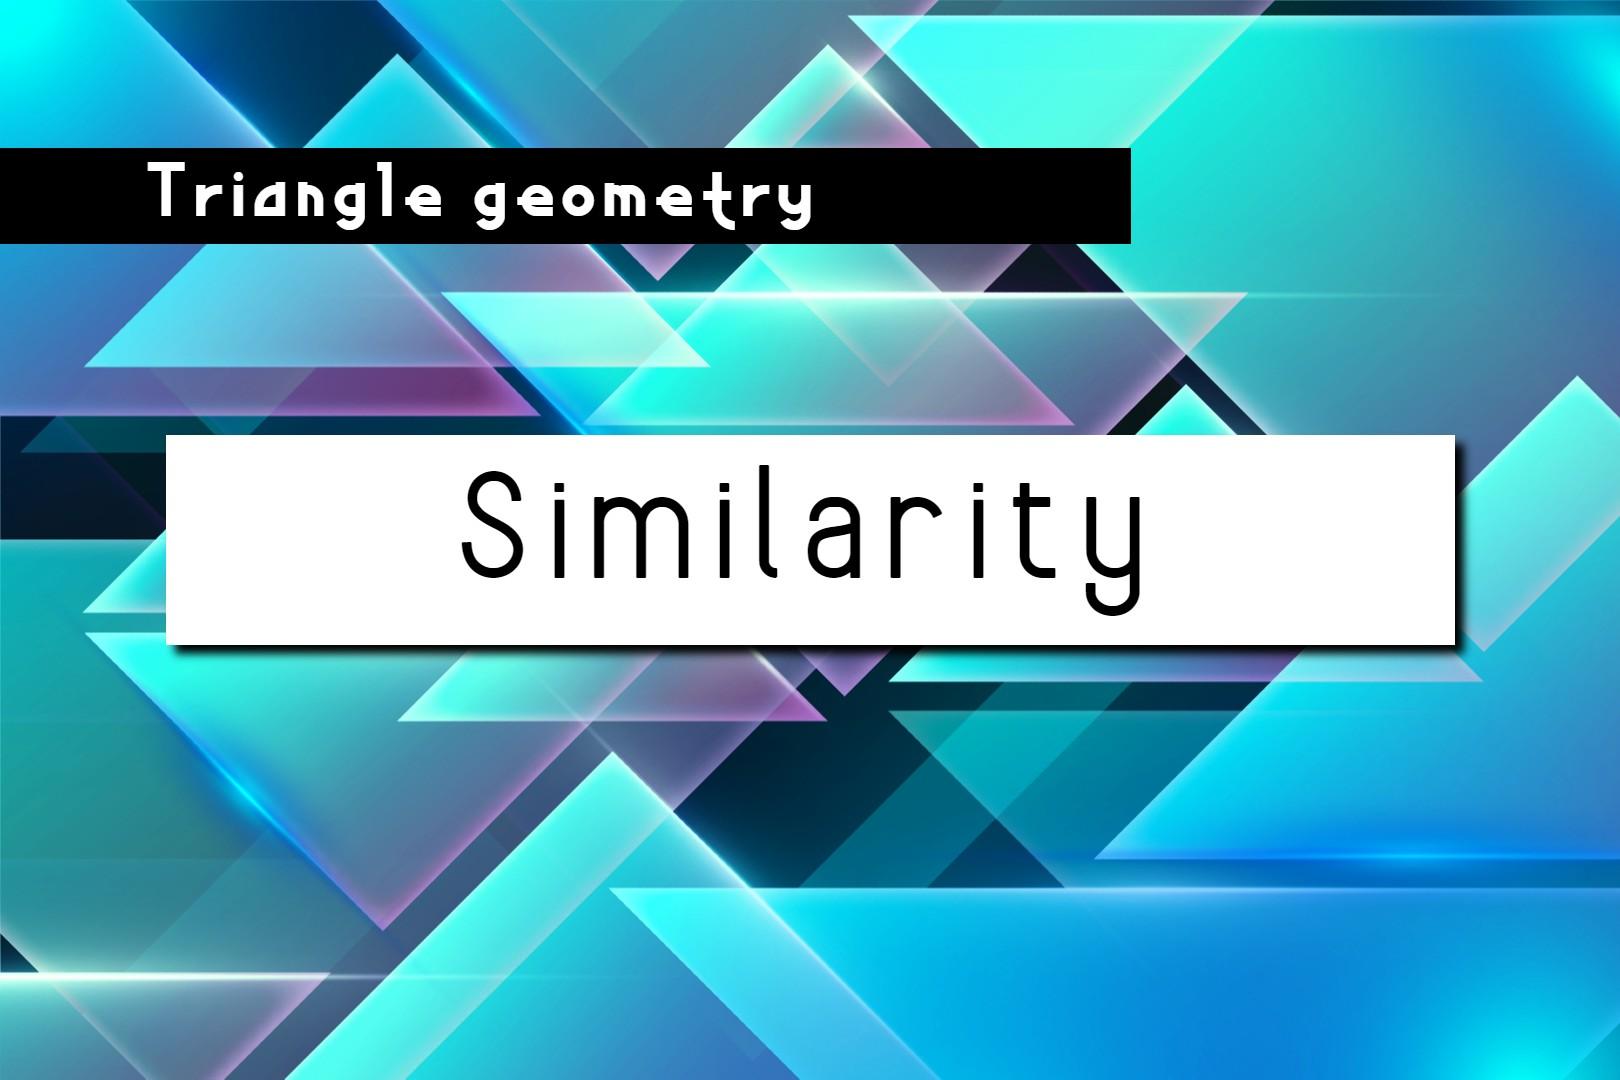 similarity triangle geometry